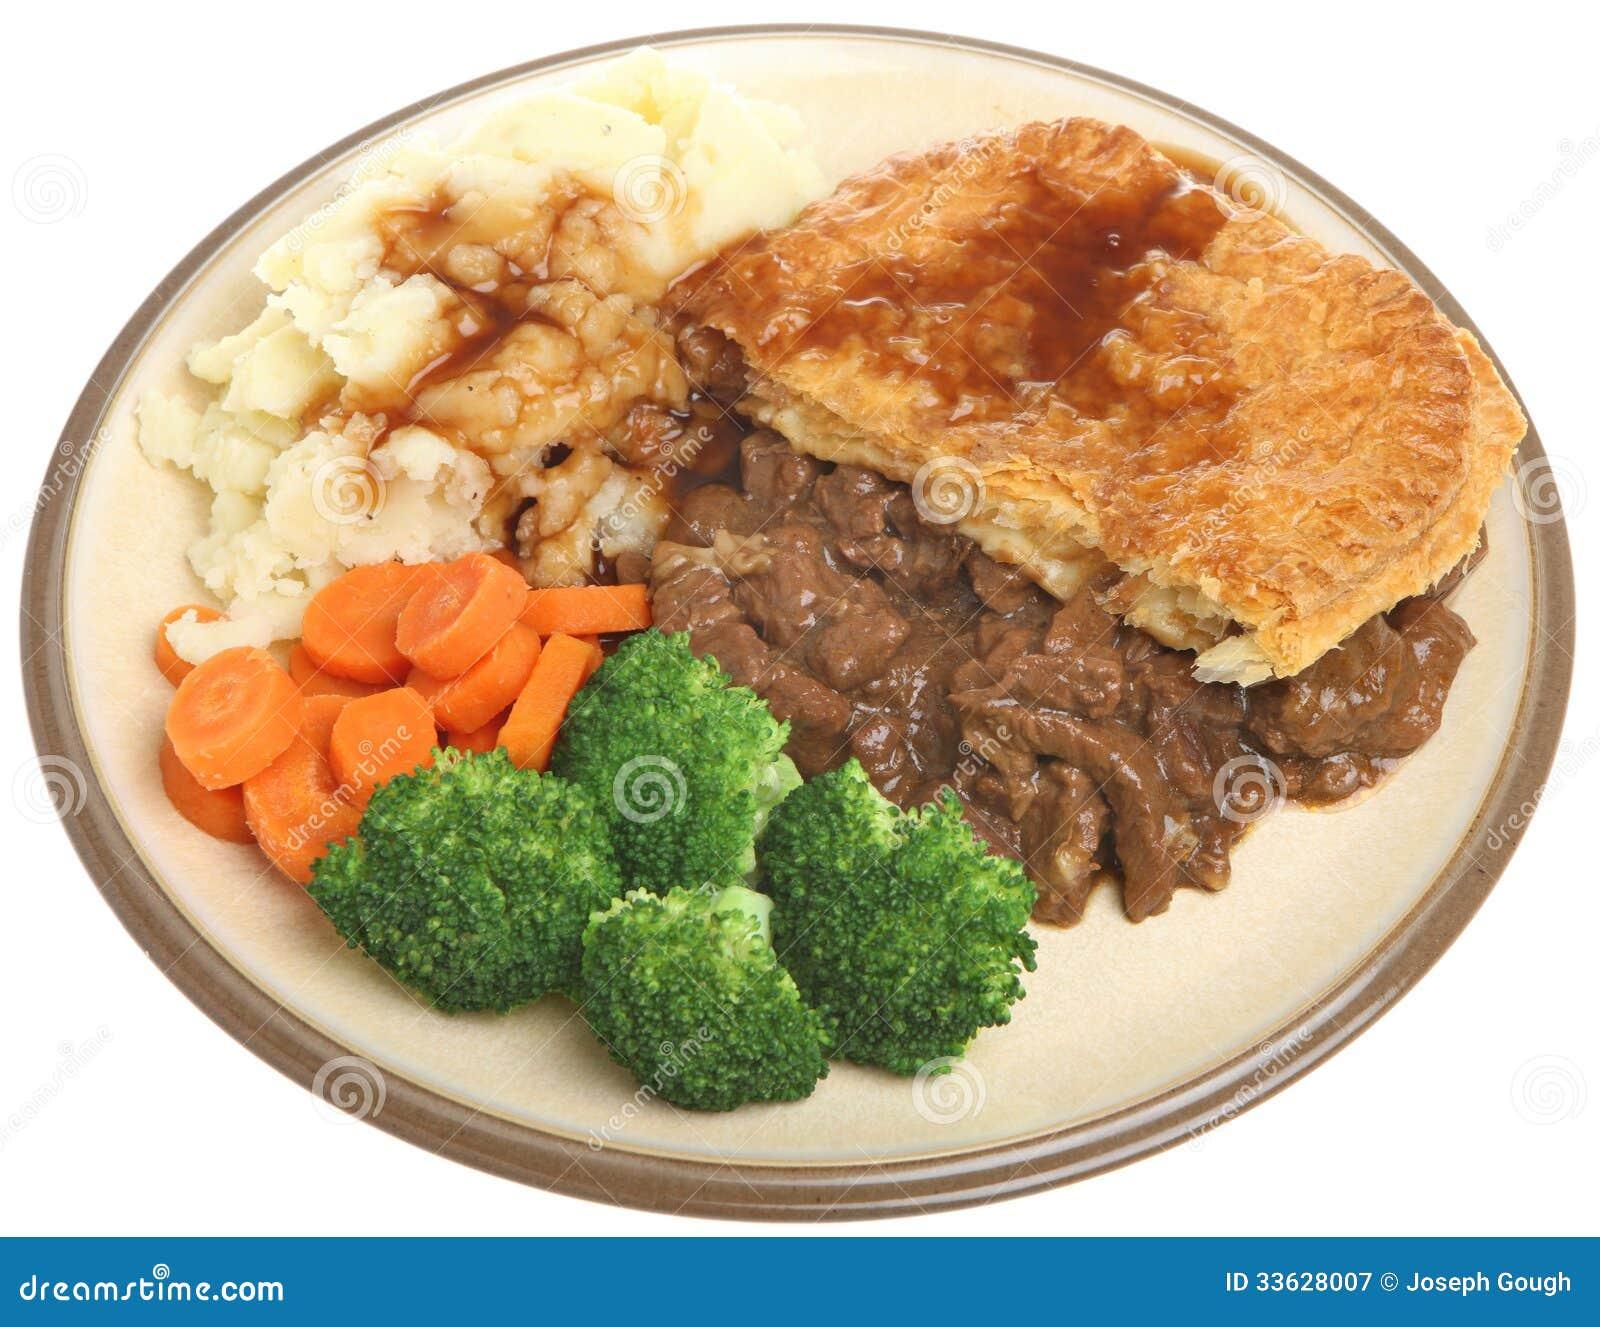 Steak Pie Dinner Plate Royalty Free Stock Photography ...